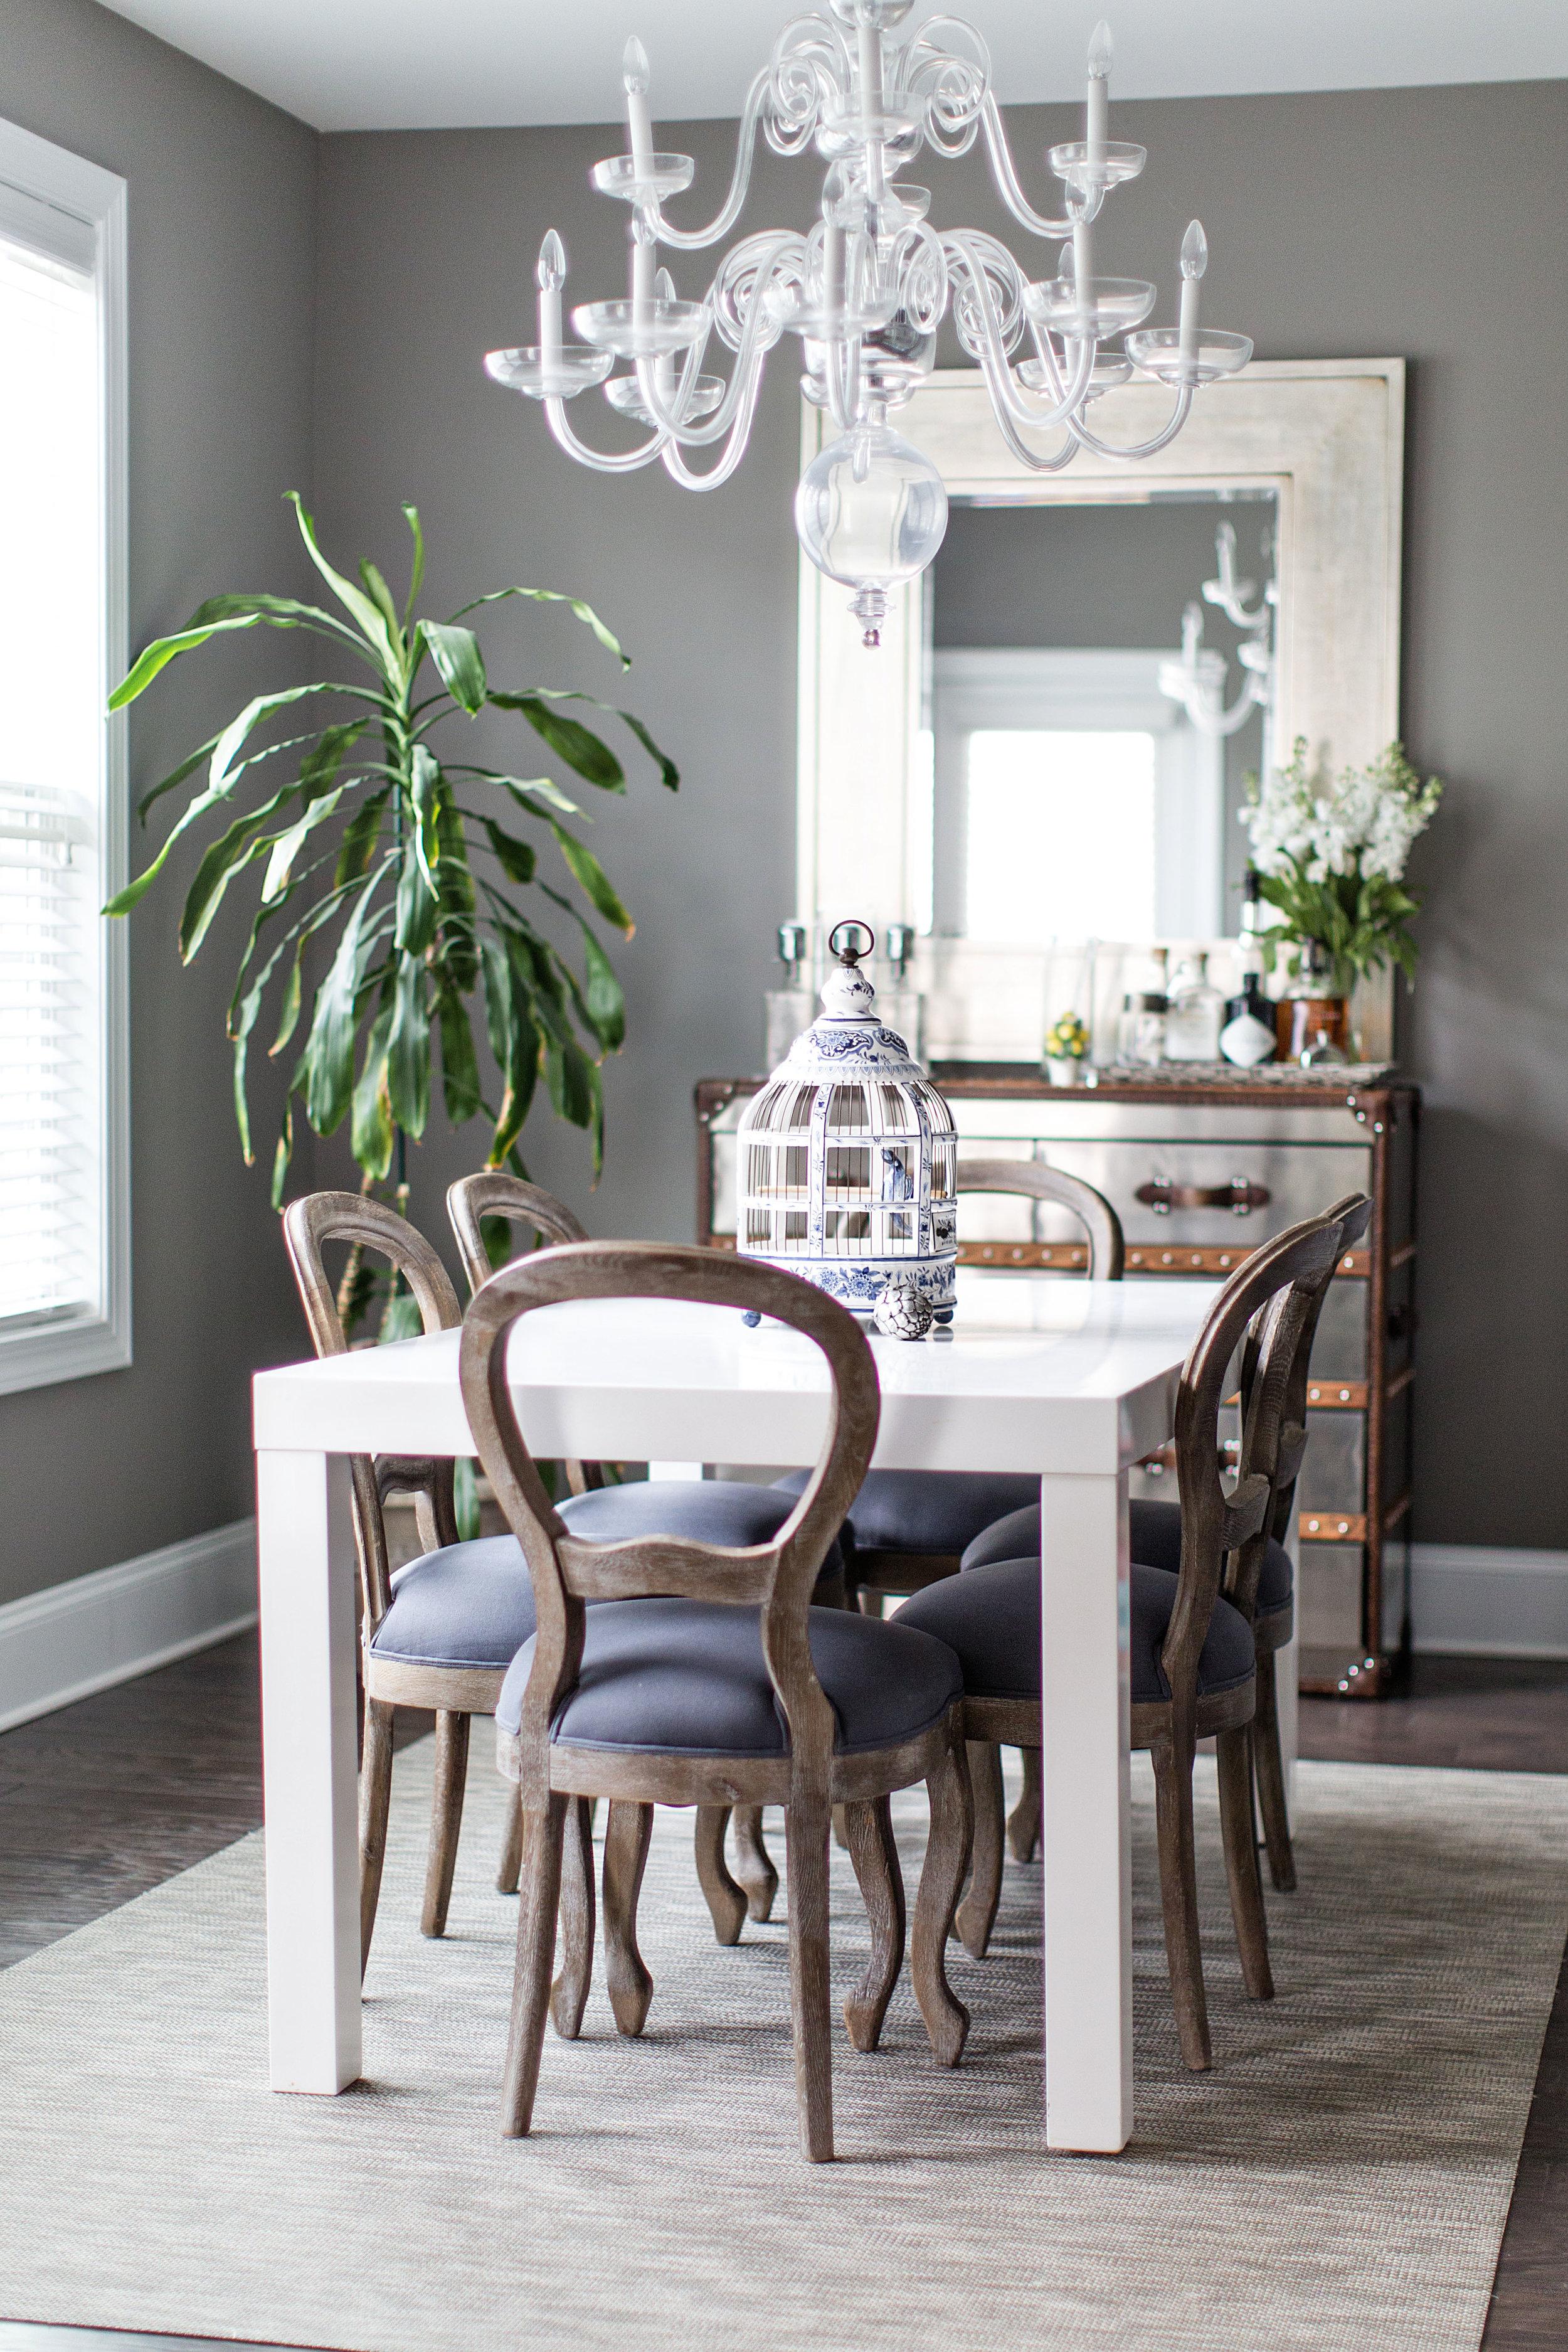 PristineParkPlace_Kitchen&Dining_Dovetail_01.jpg